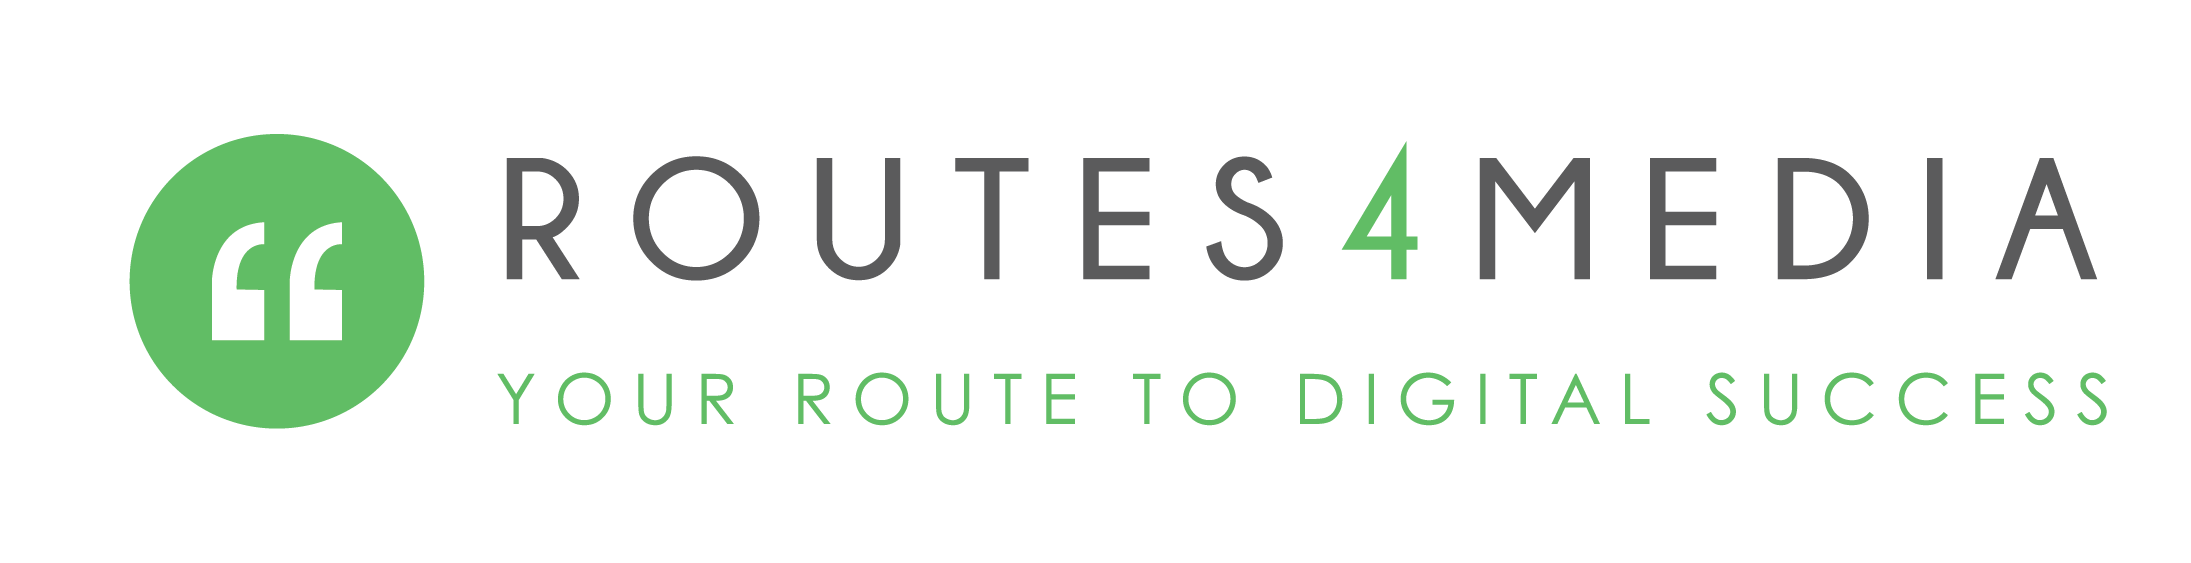 Routes 4 Media